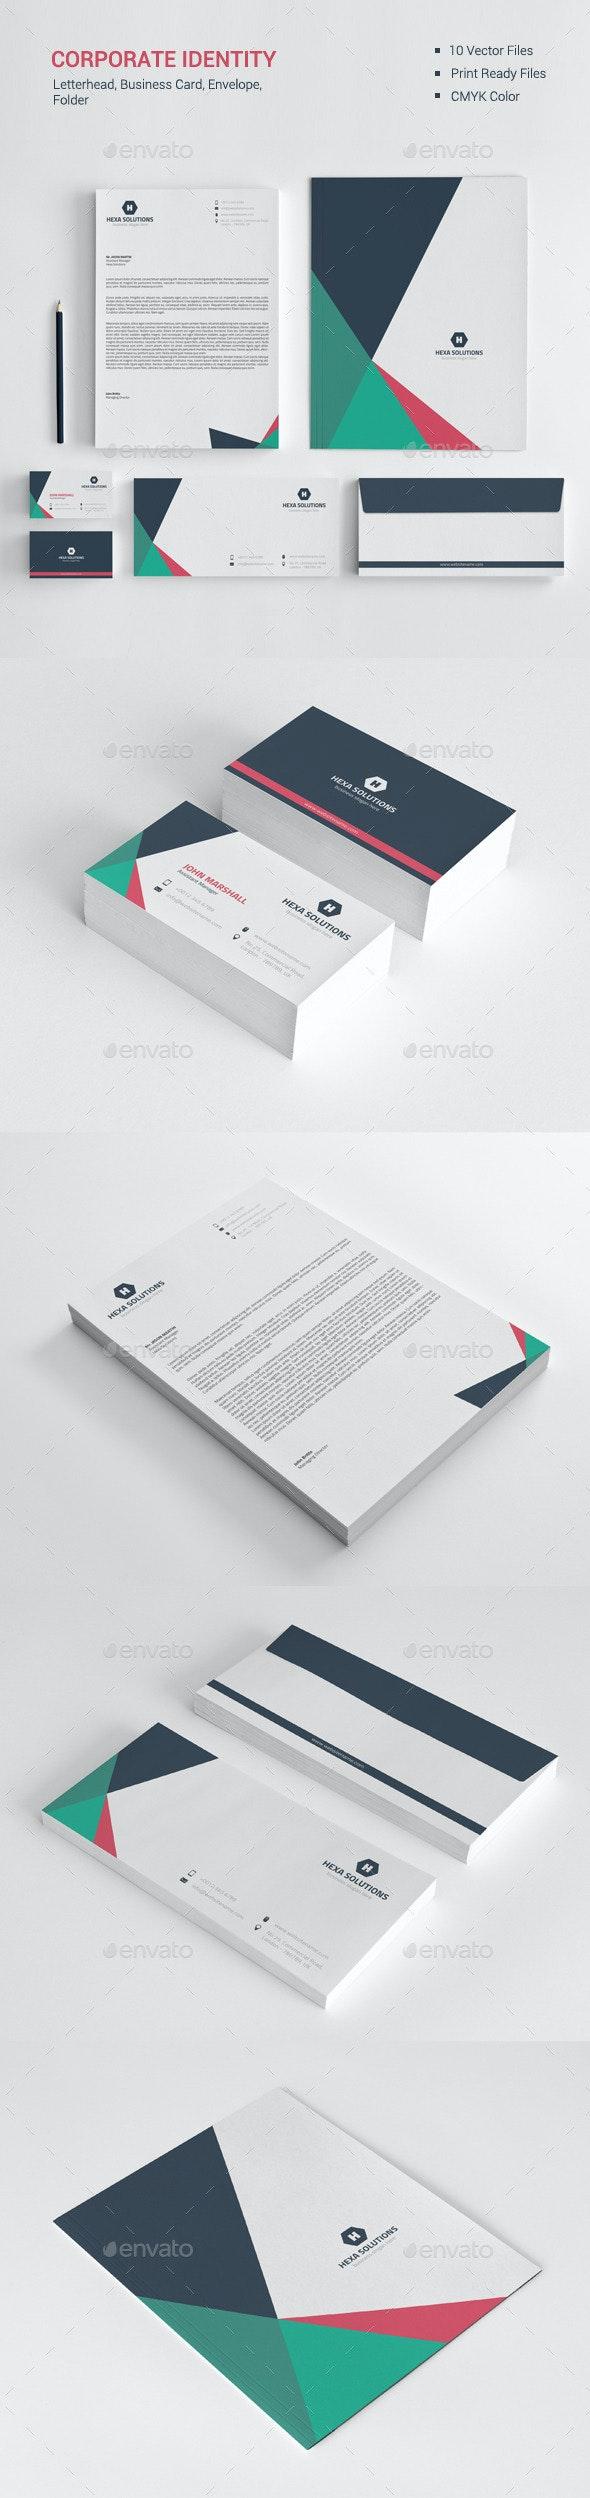 Corporate Identity 04 - Stationery Print Templates